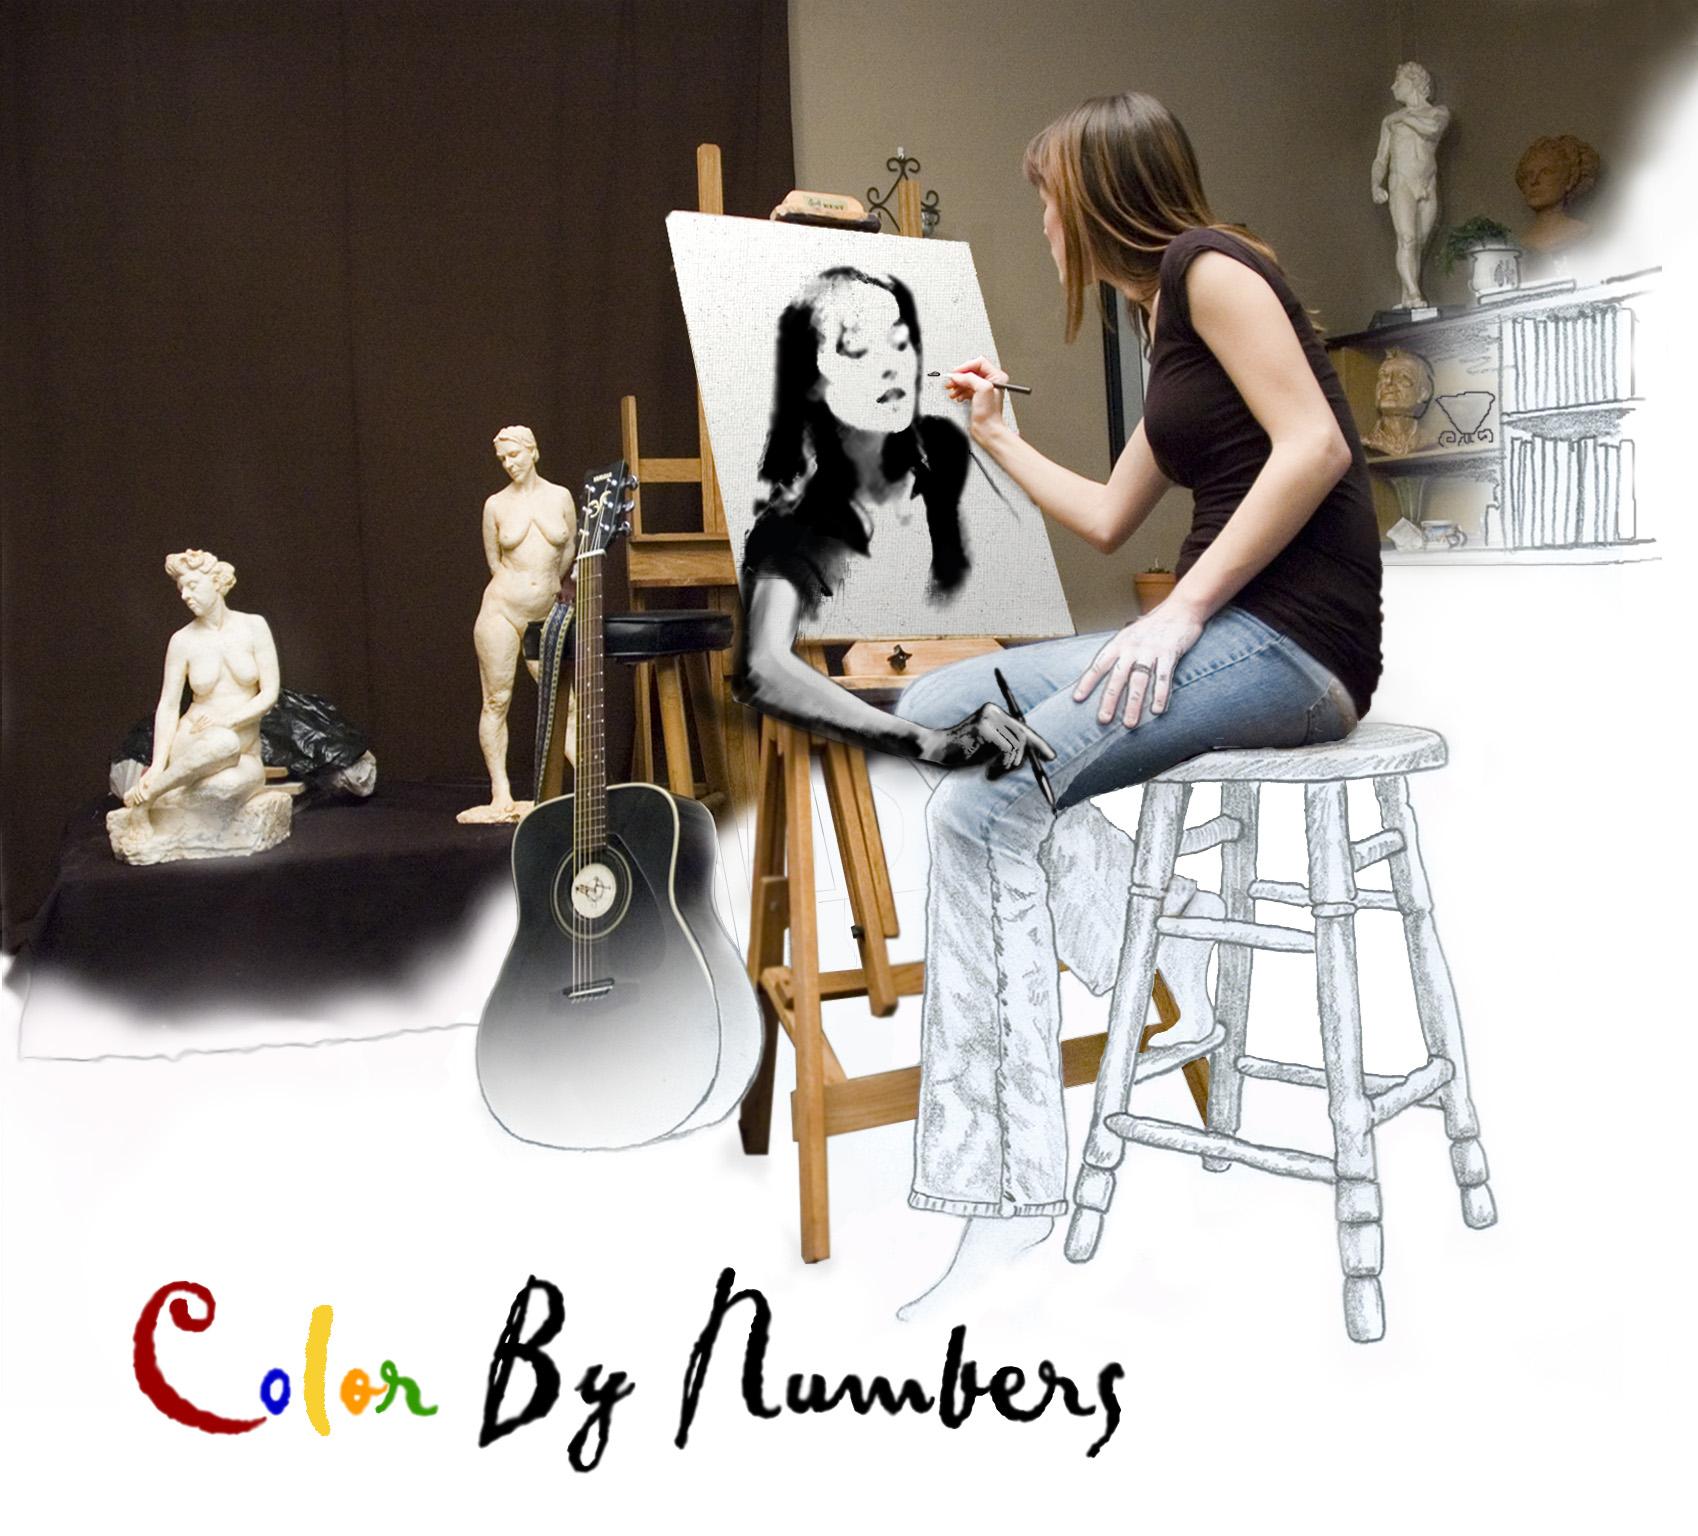 ColorbyNumbersplainNoText1.jpg